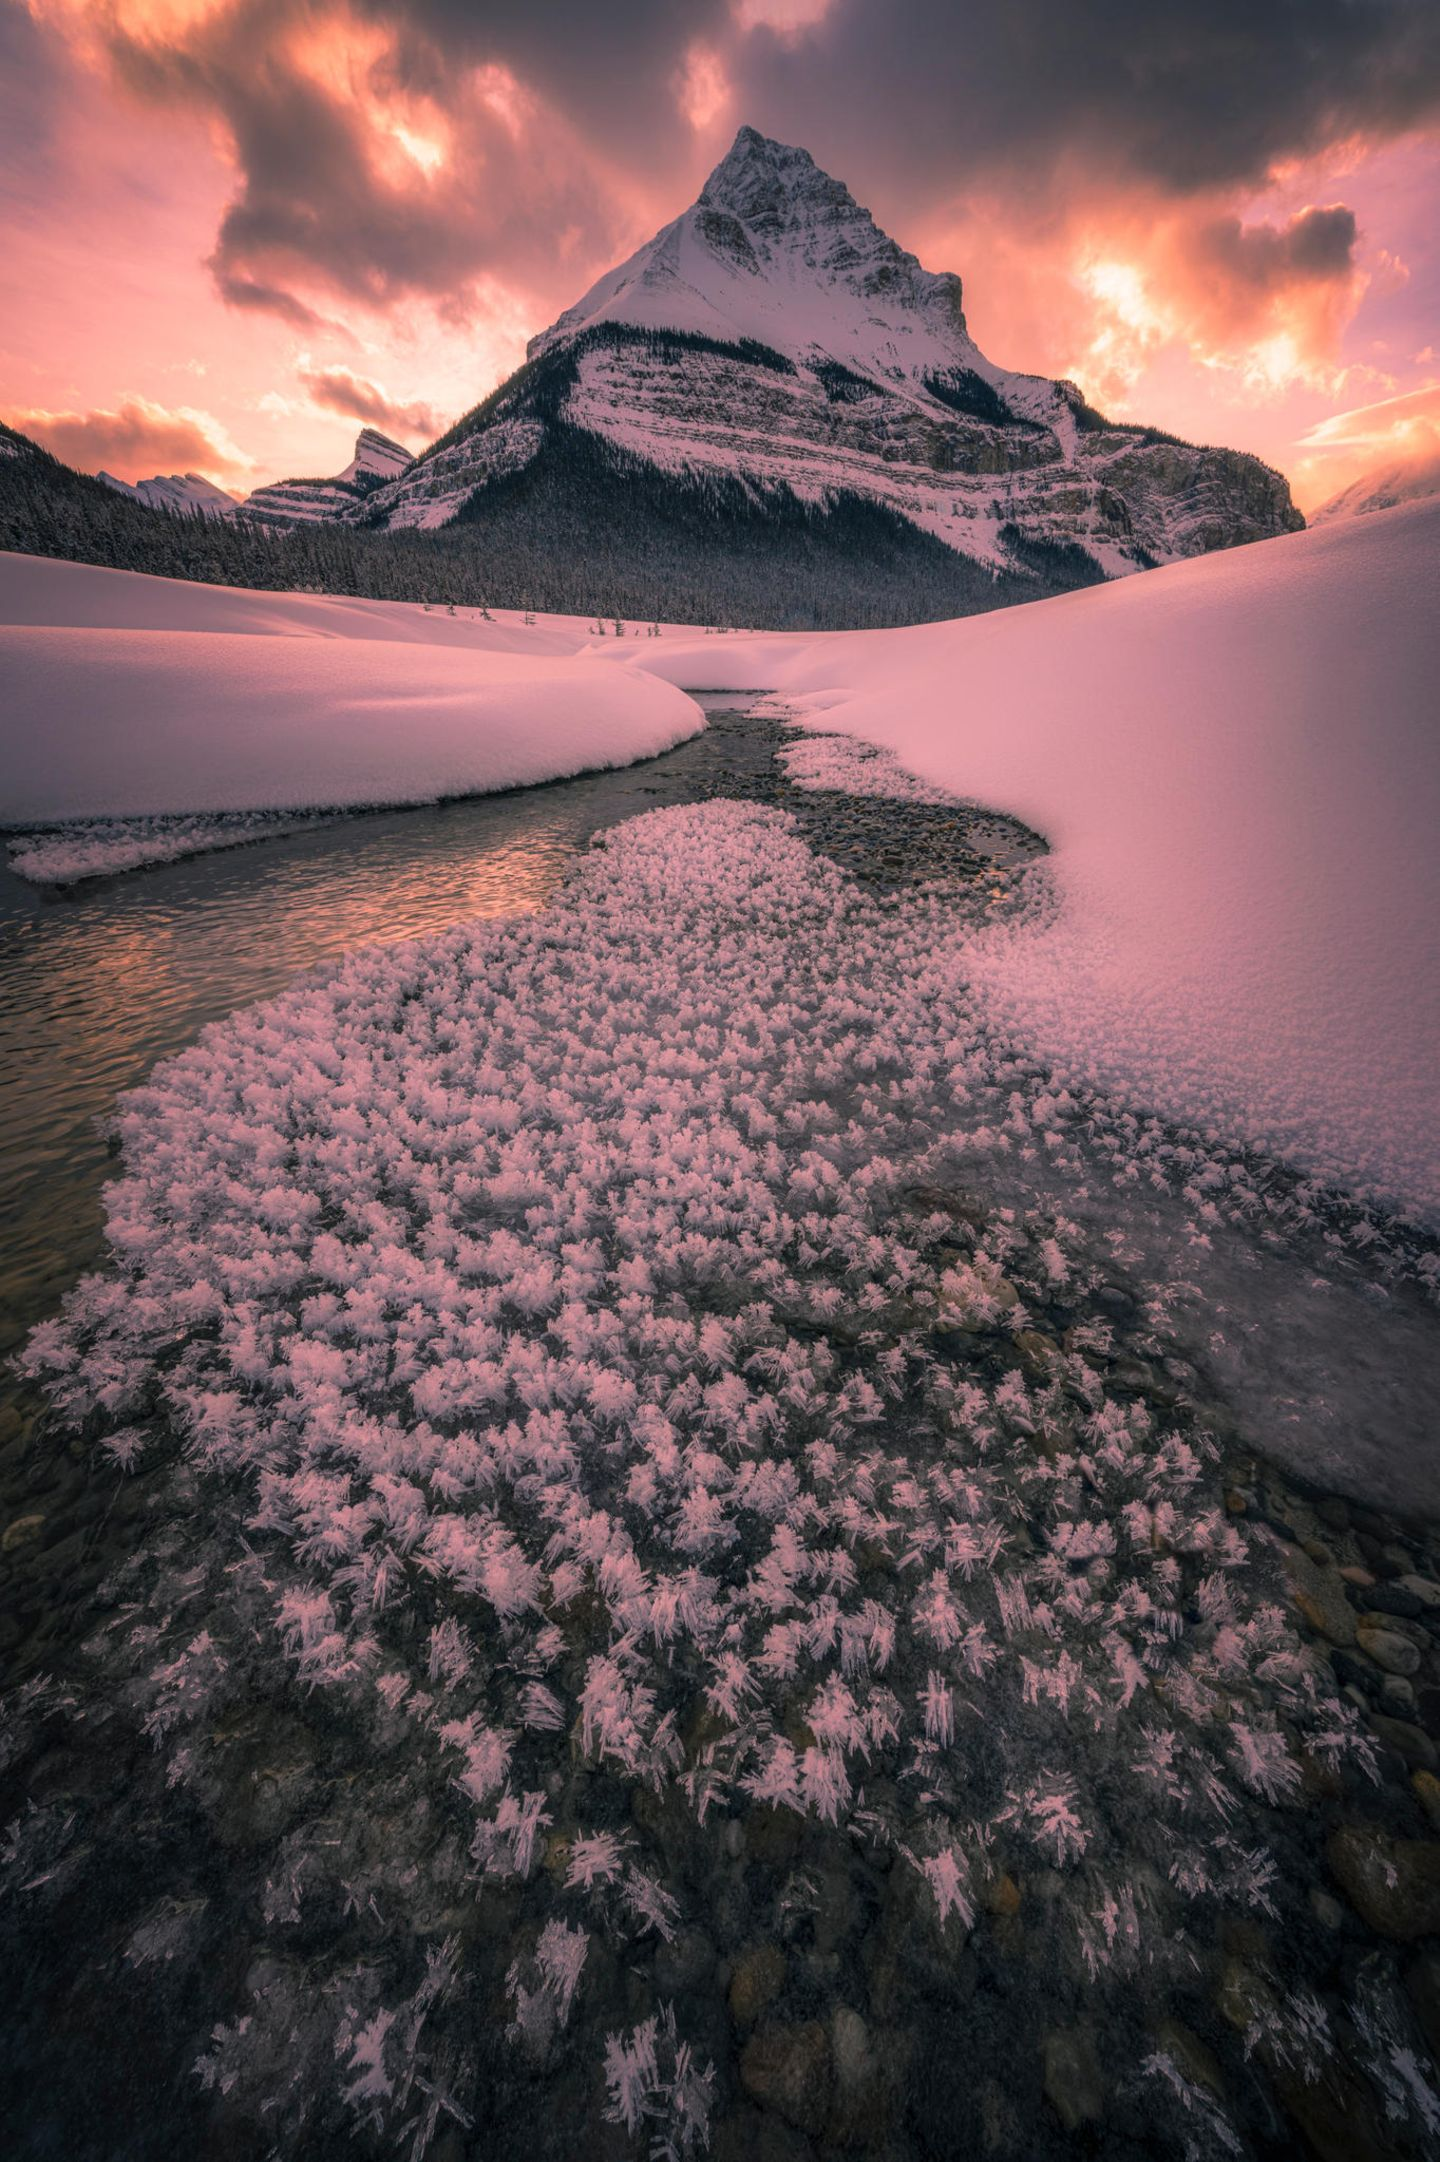 ILPOTY 2020: Berg mit Schnee